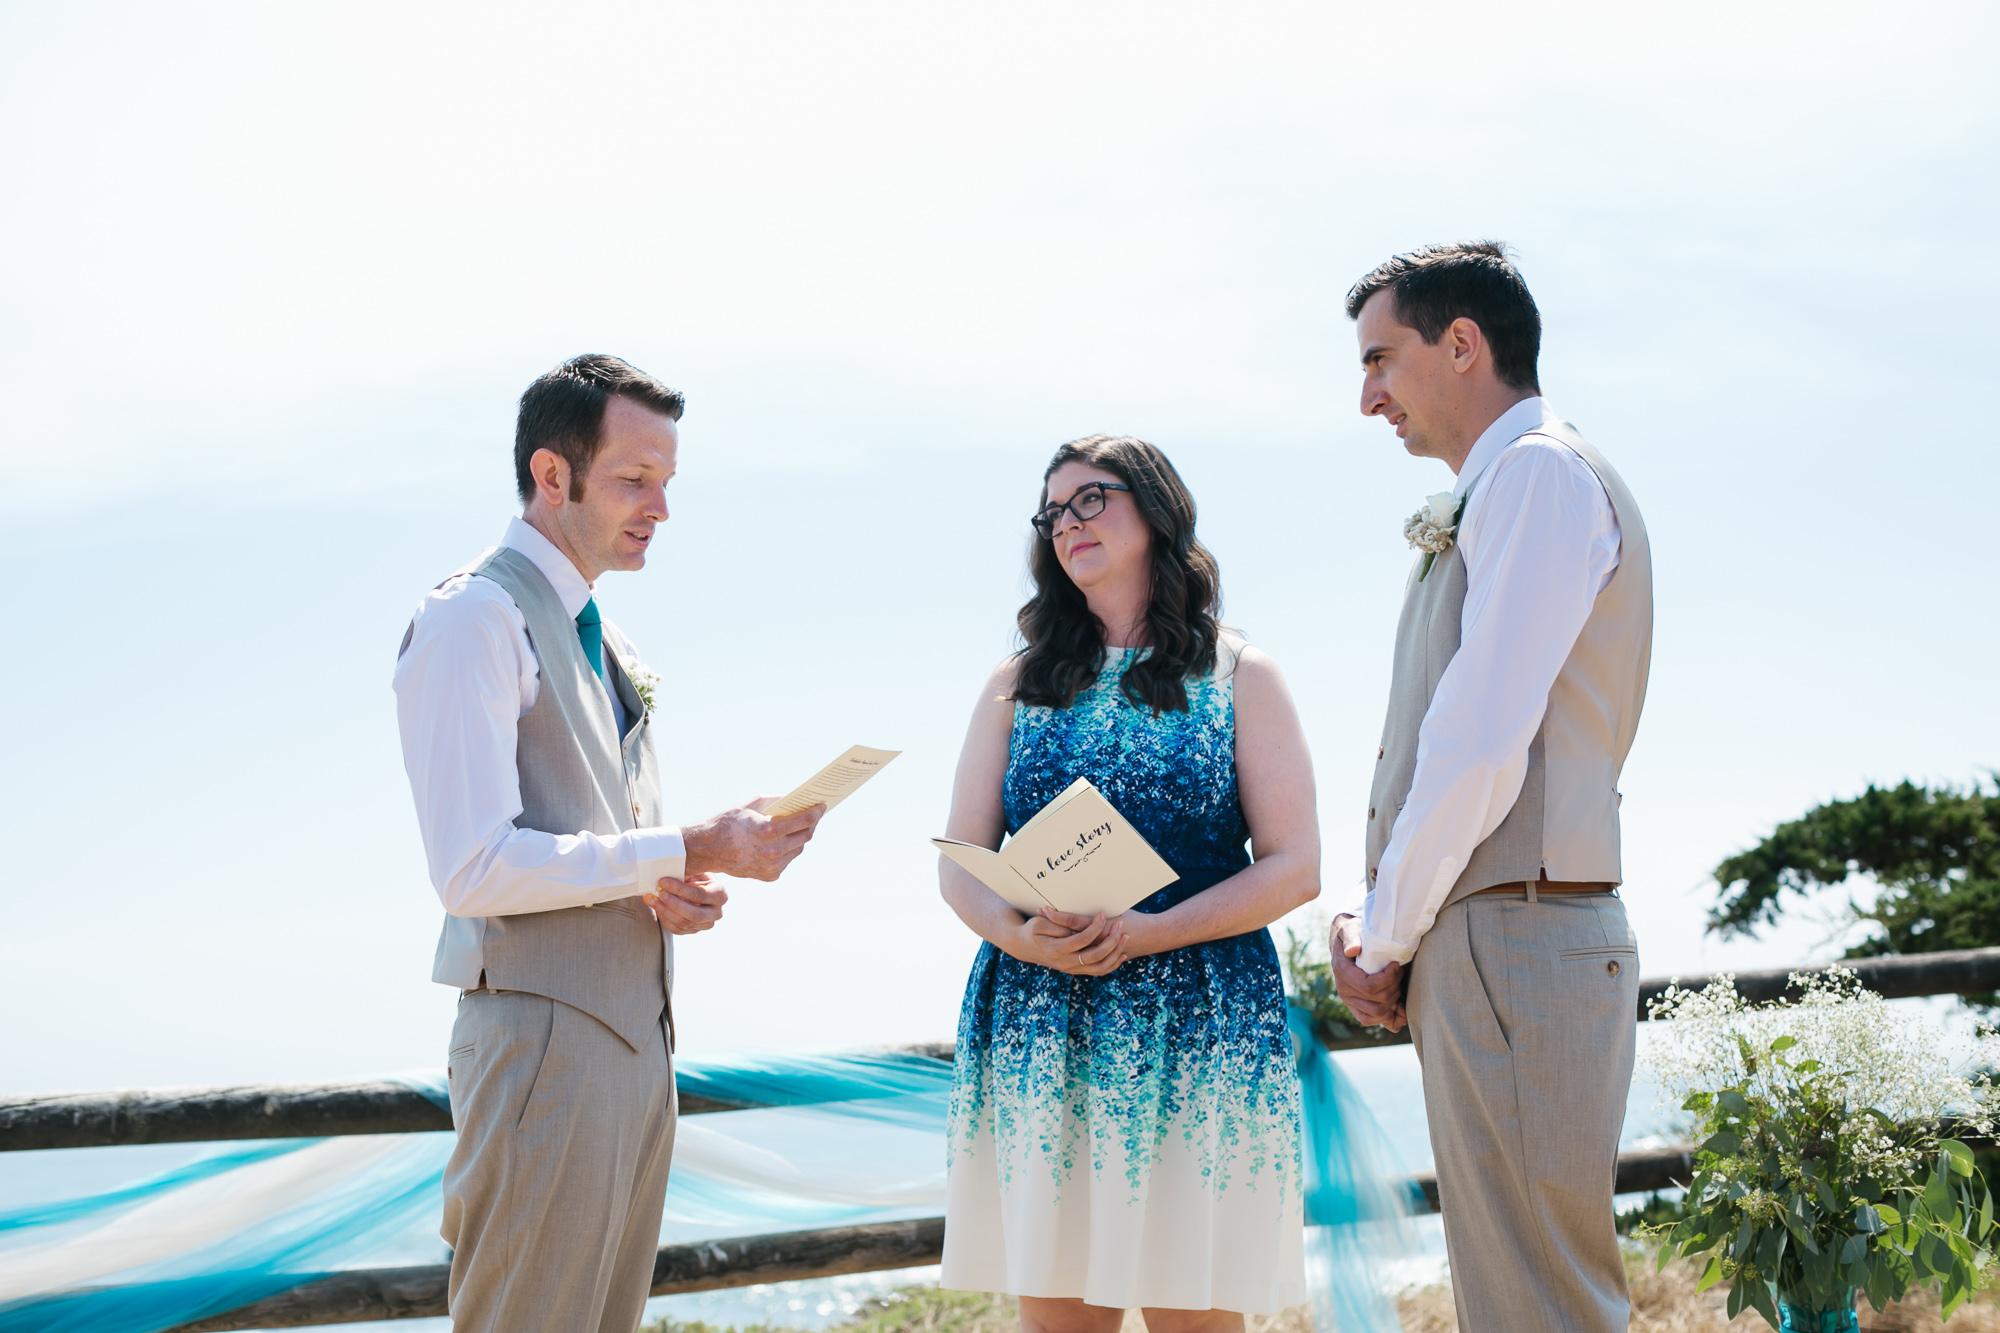 10_Cambria_wedding_samesex_coastal_intimate_Central_Coast_beach.jpg